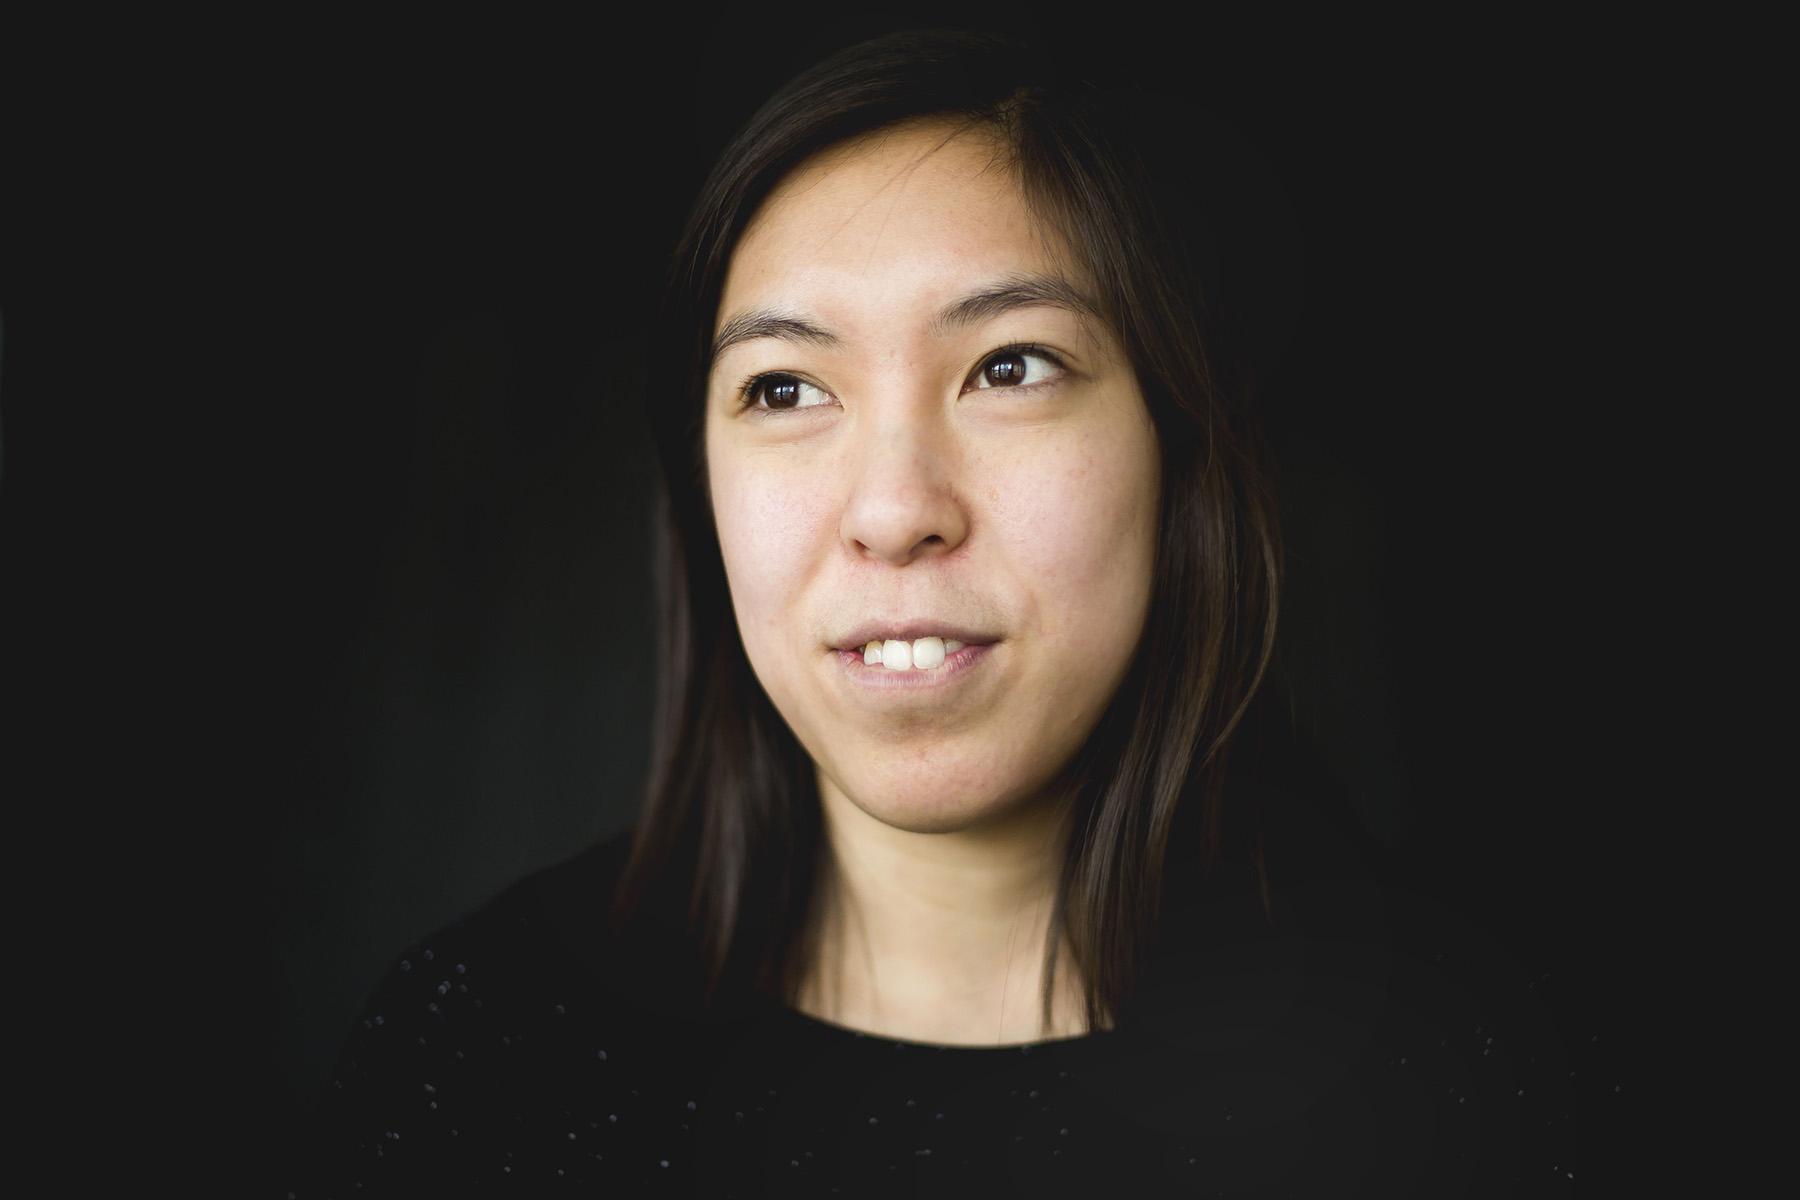 A portrait of a female graduate student.